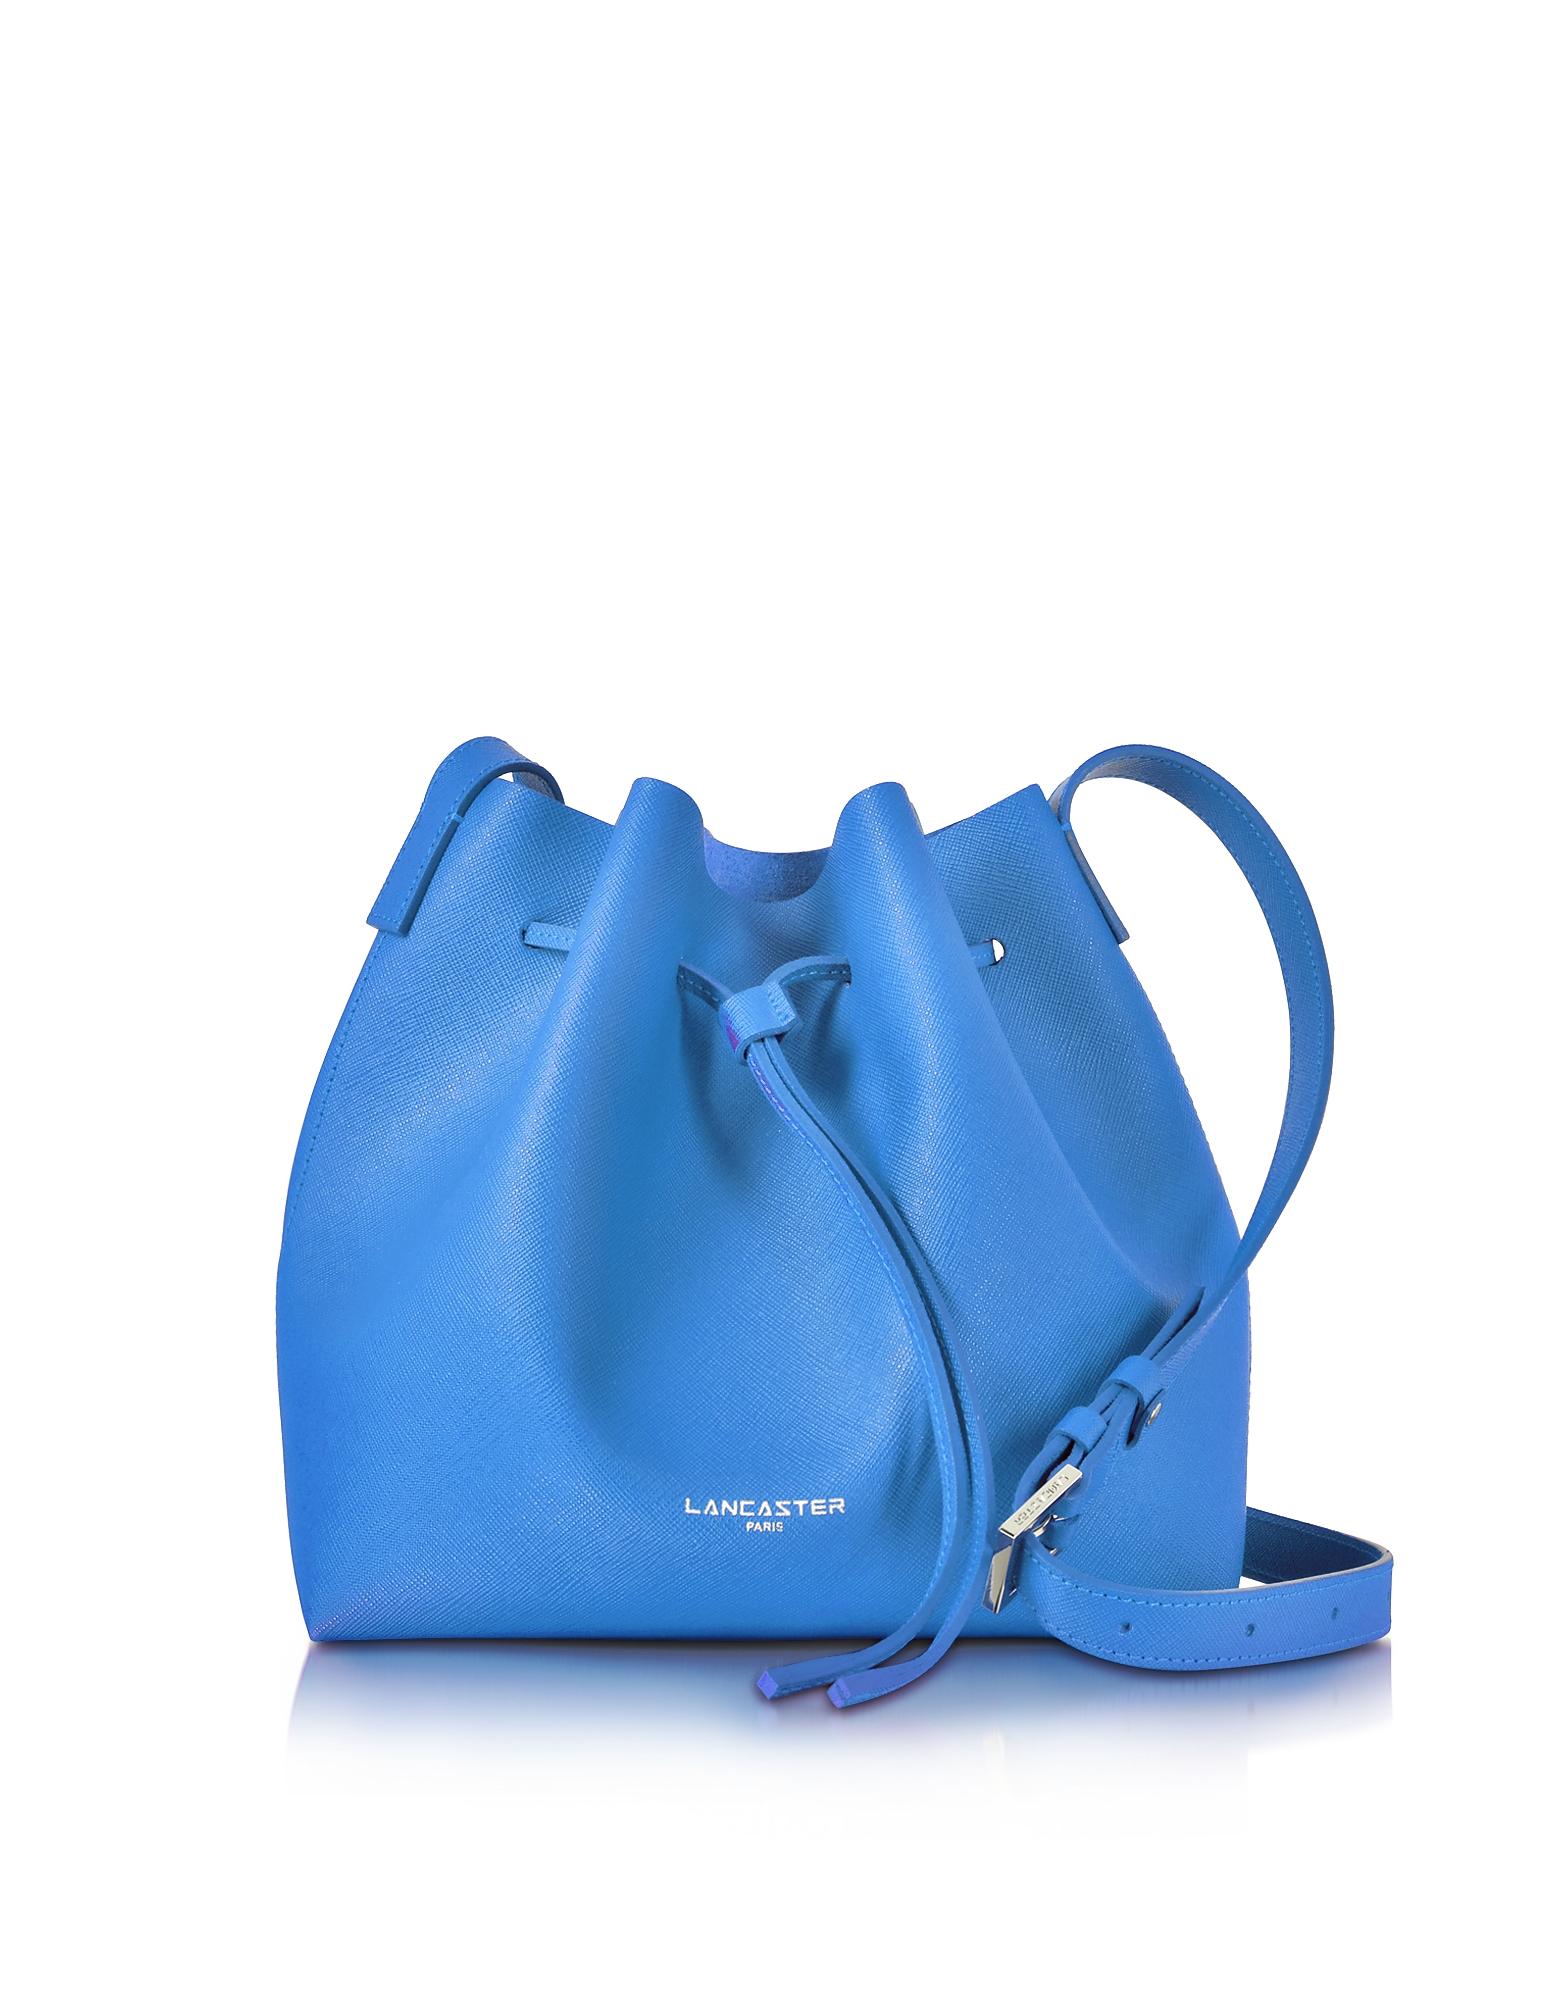 Lancaster Paris Handbags, Pur Smooth Blue Leather Bucket Bag